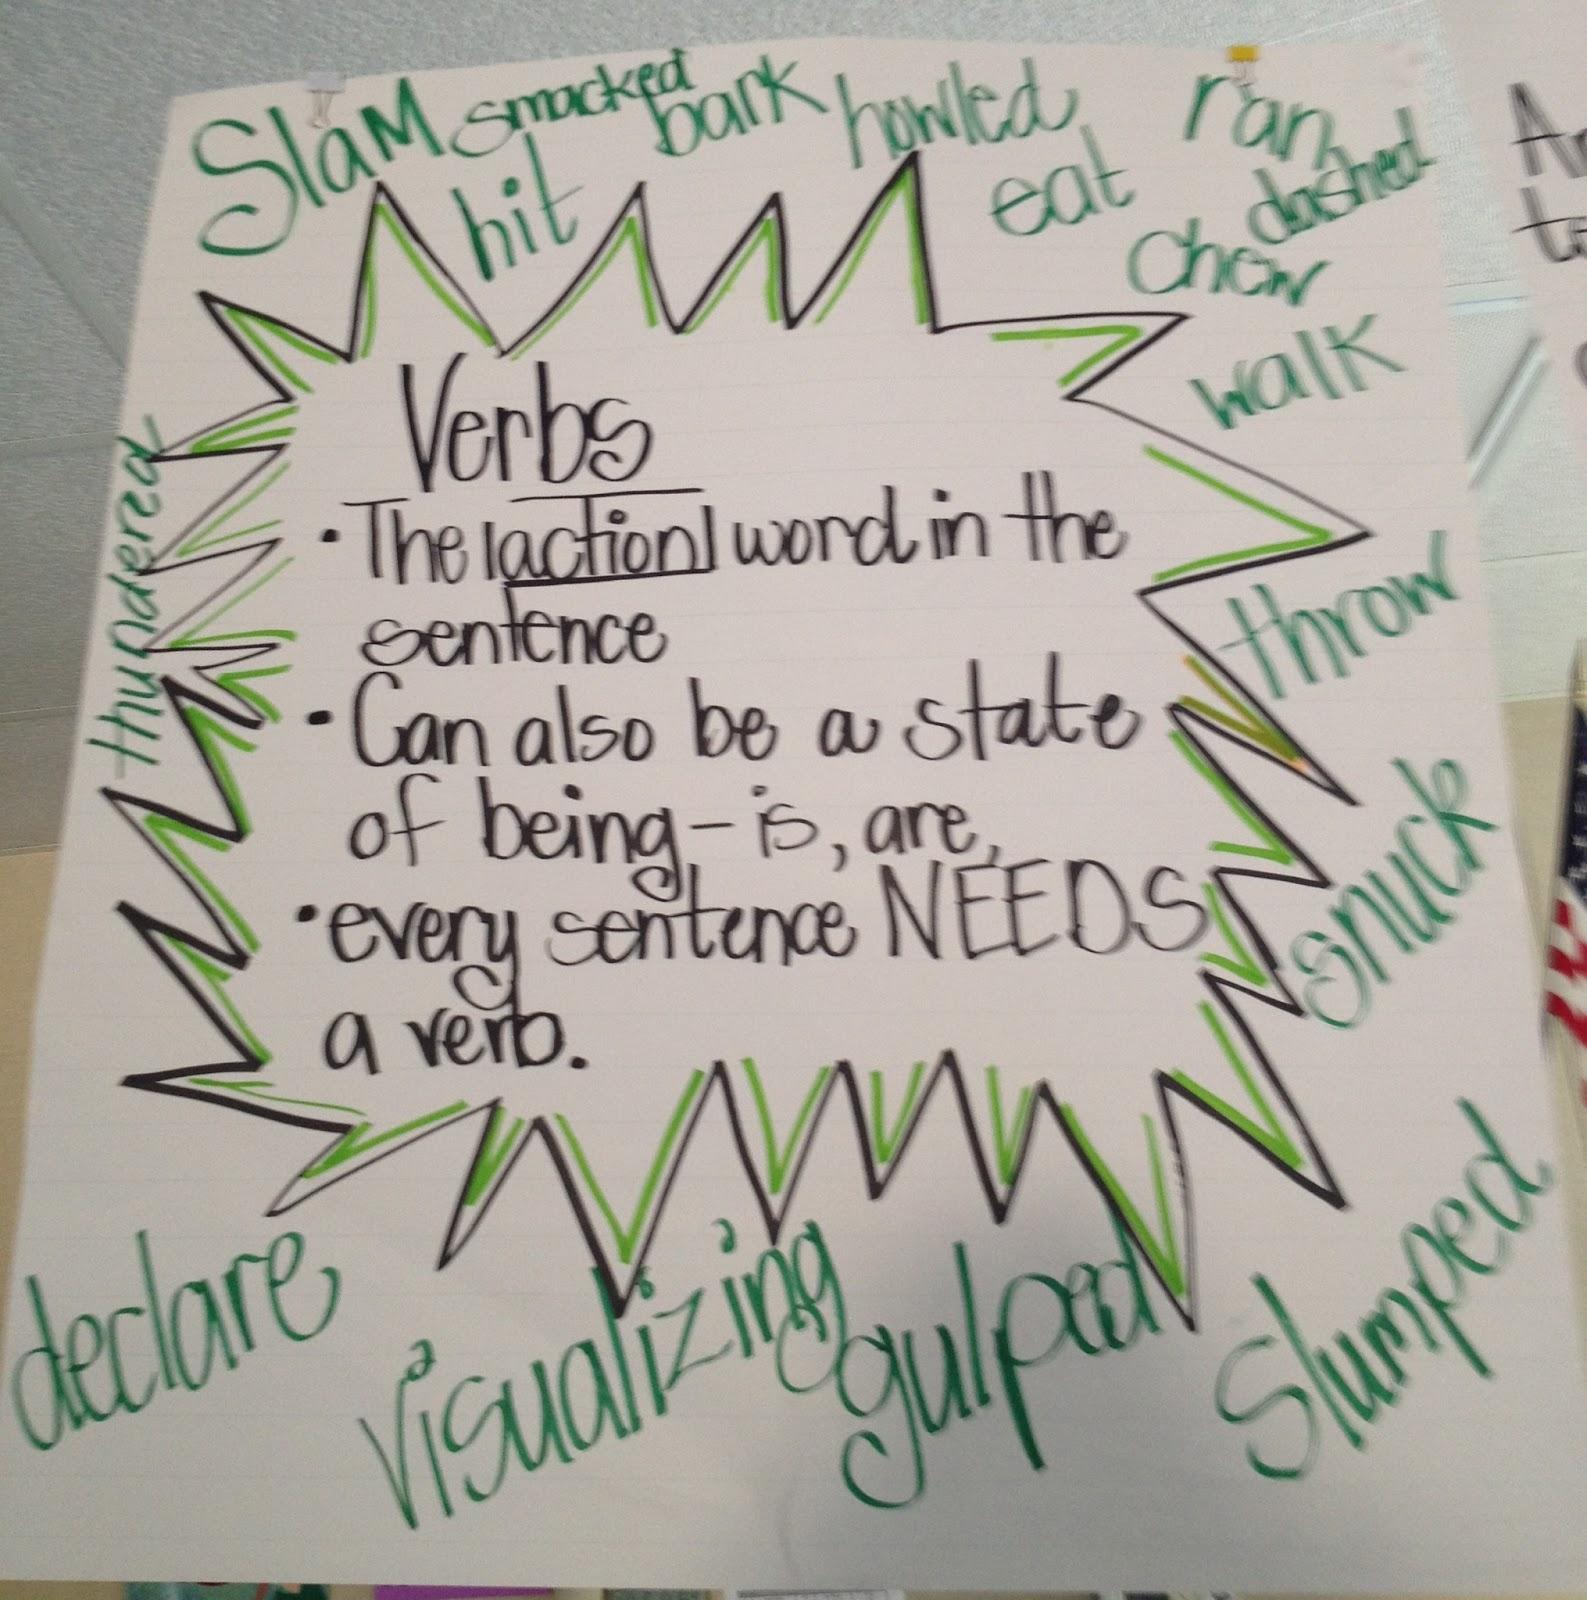 hight resolution of Verbs - Mrs. Warner's Learning Community